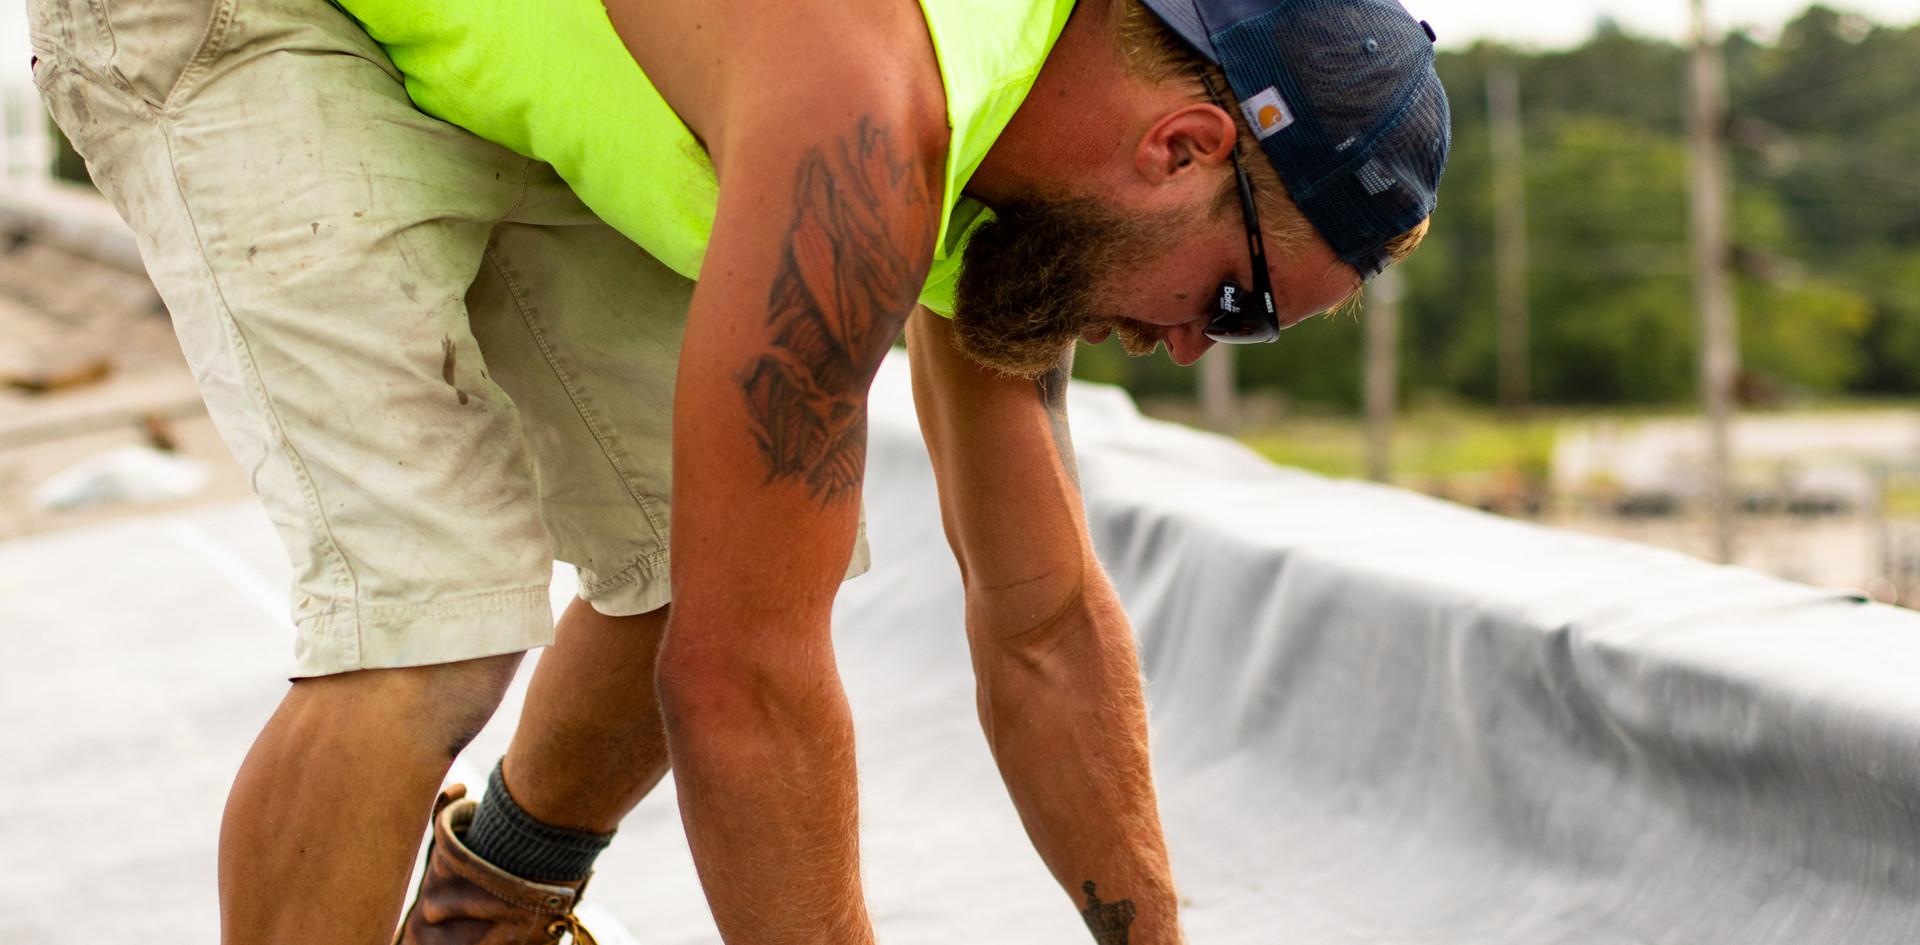 Trent-Hopkins-Roofing-Crews